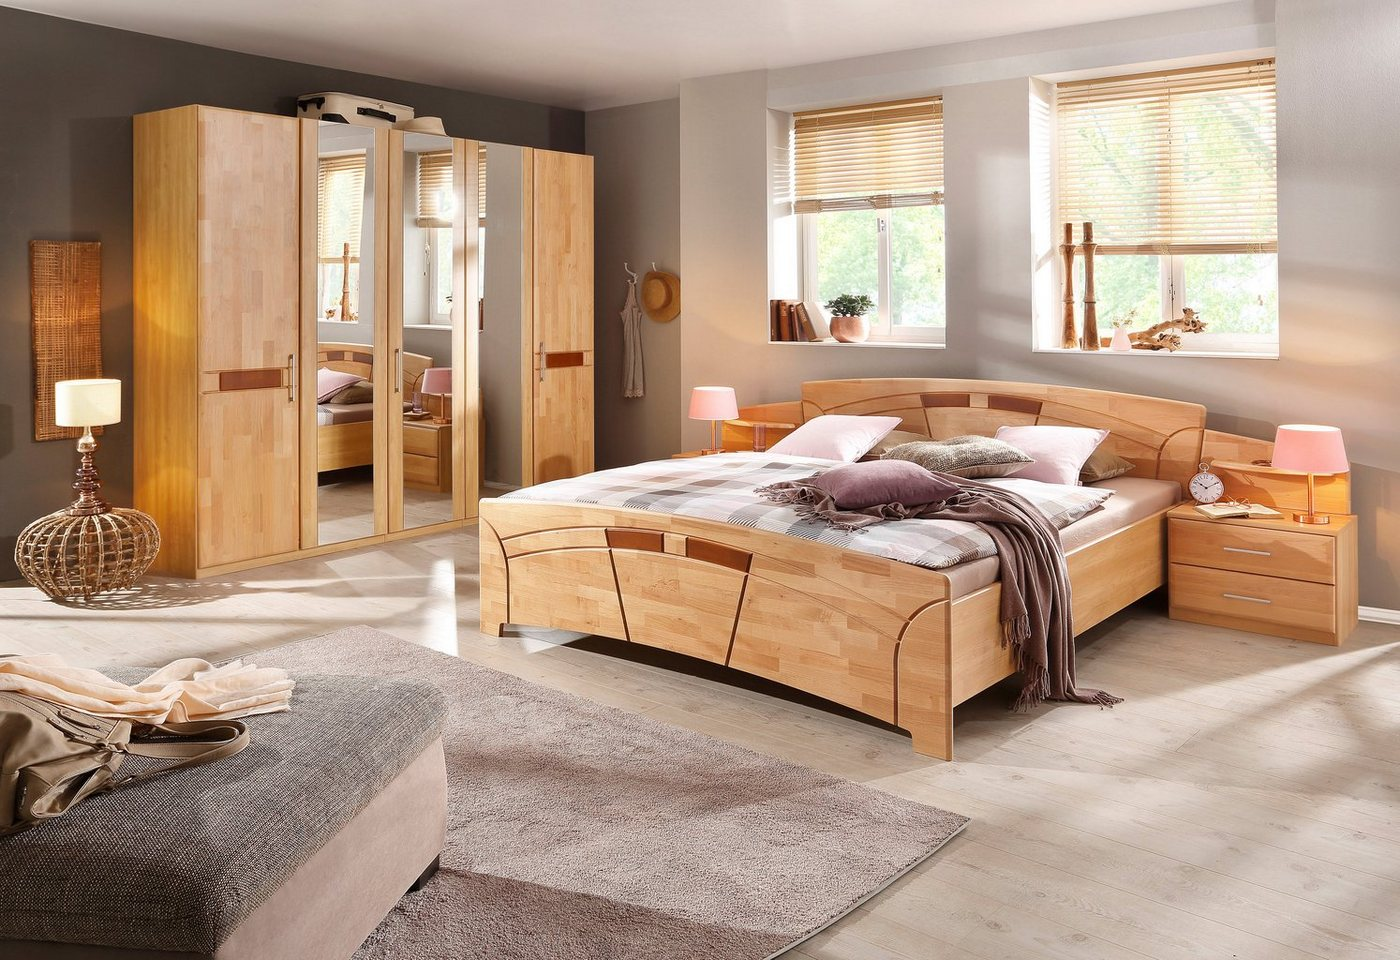 HOME AFFAIRE slaapkamermeubelen in 4-delige set Sarah, met ledikant 180x200 en 5- of 6-deurs kast